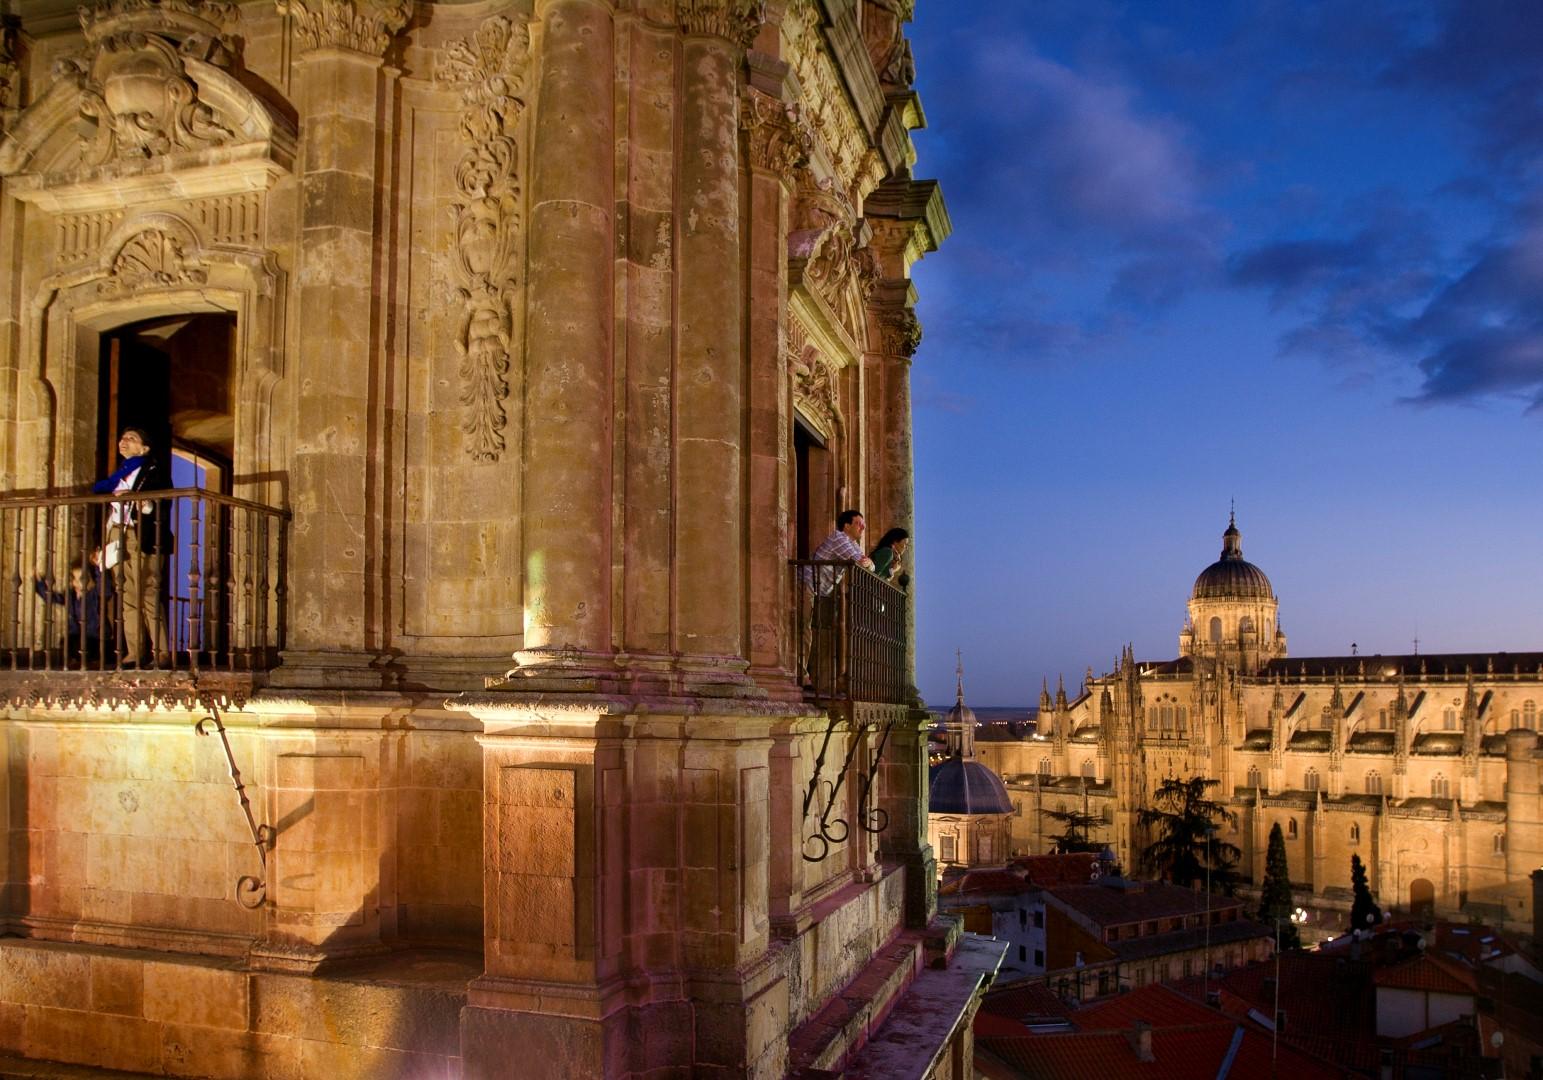 SALAMANCA-TorresClerecia-Catedral-Turismo-de-Salamanca